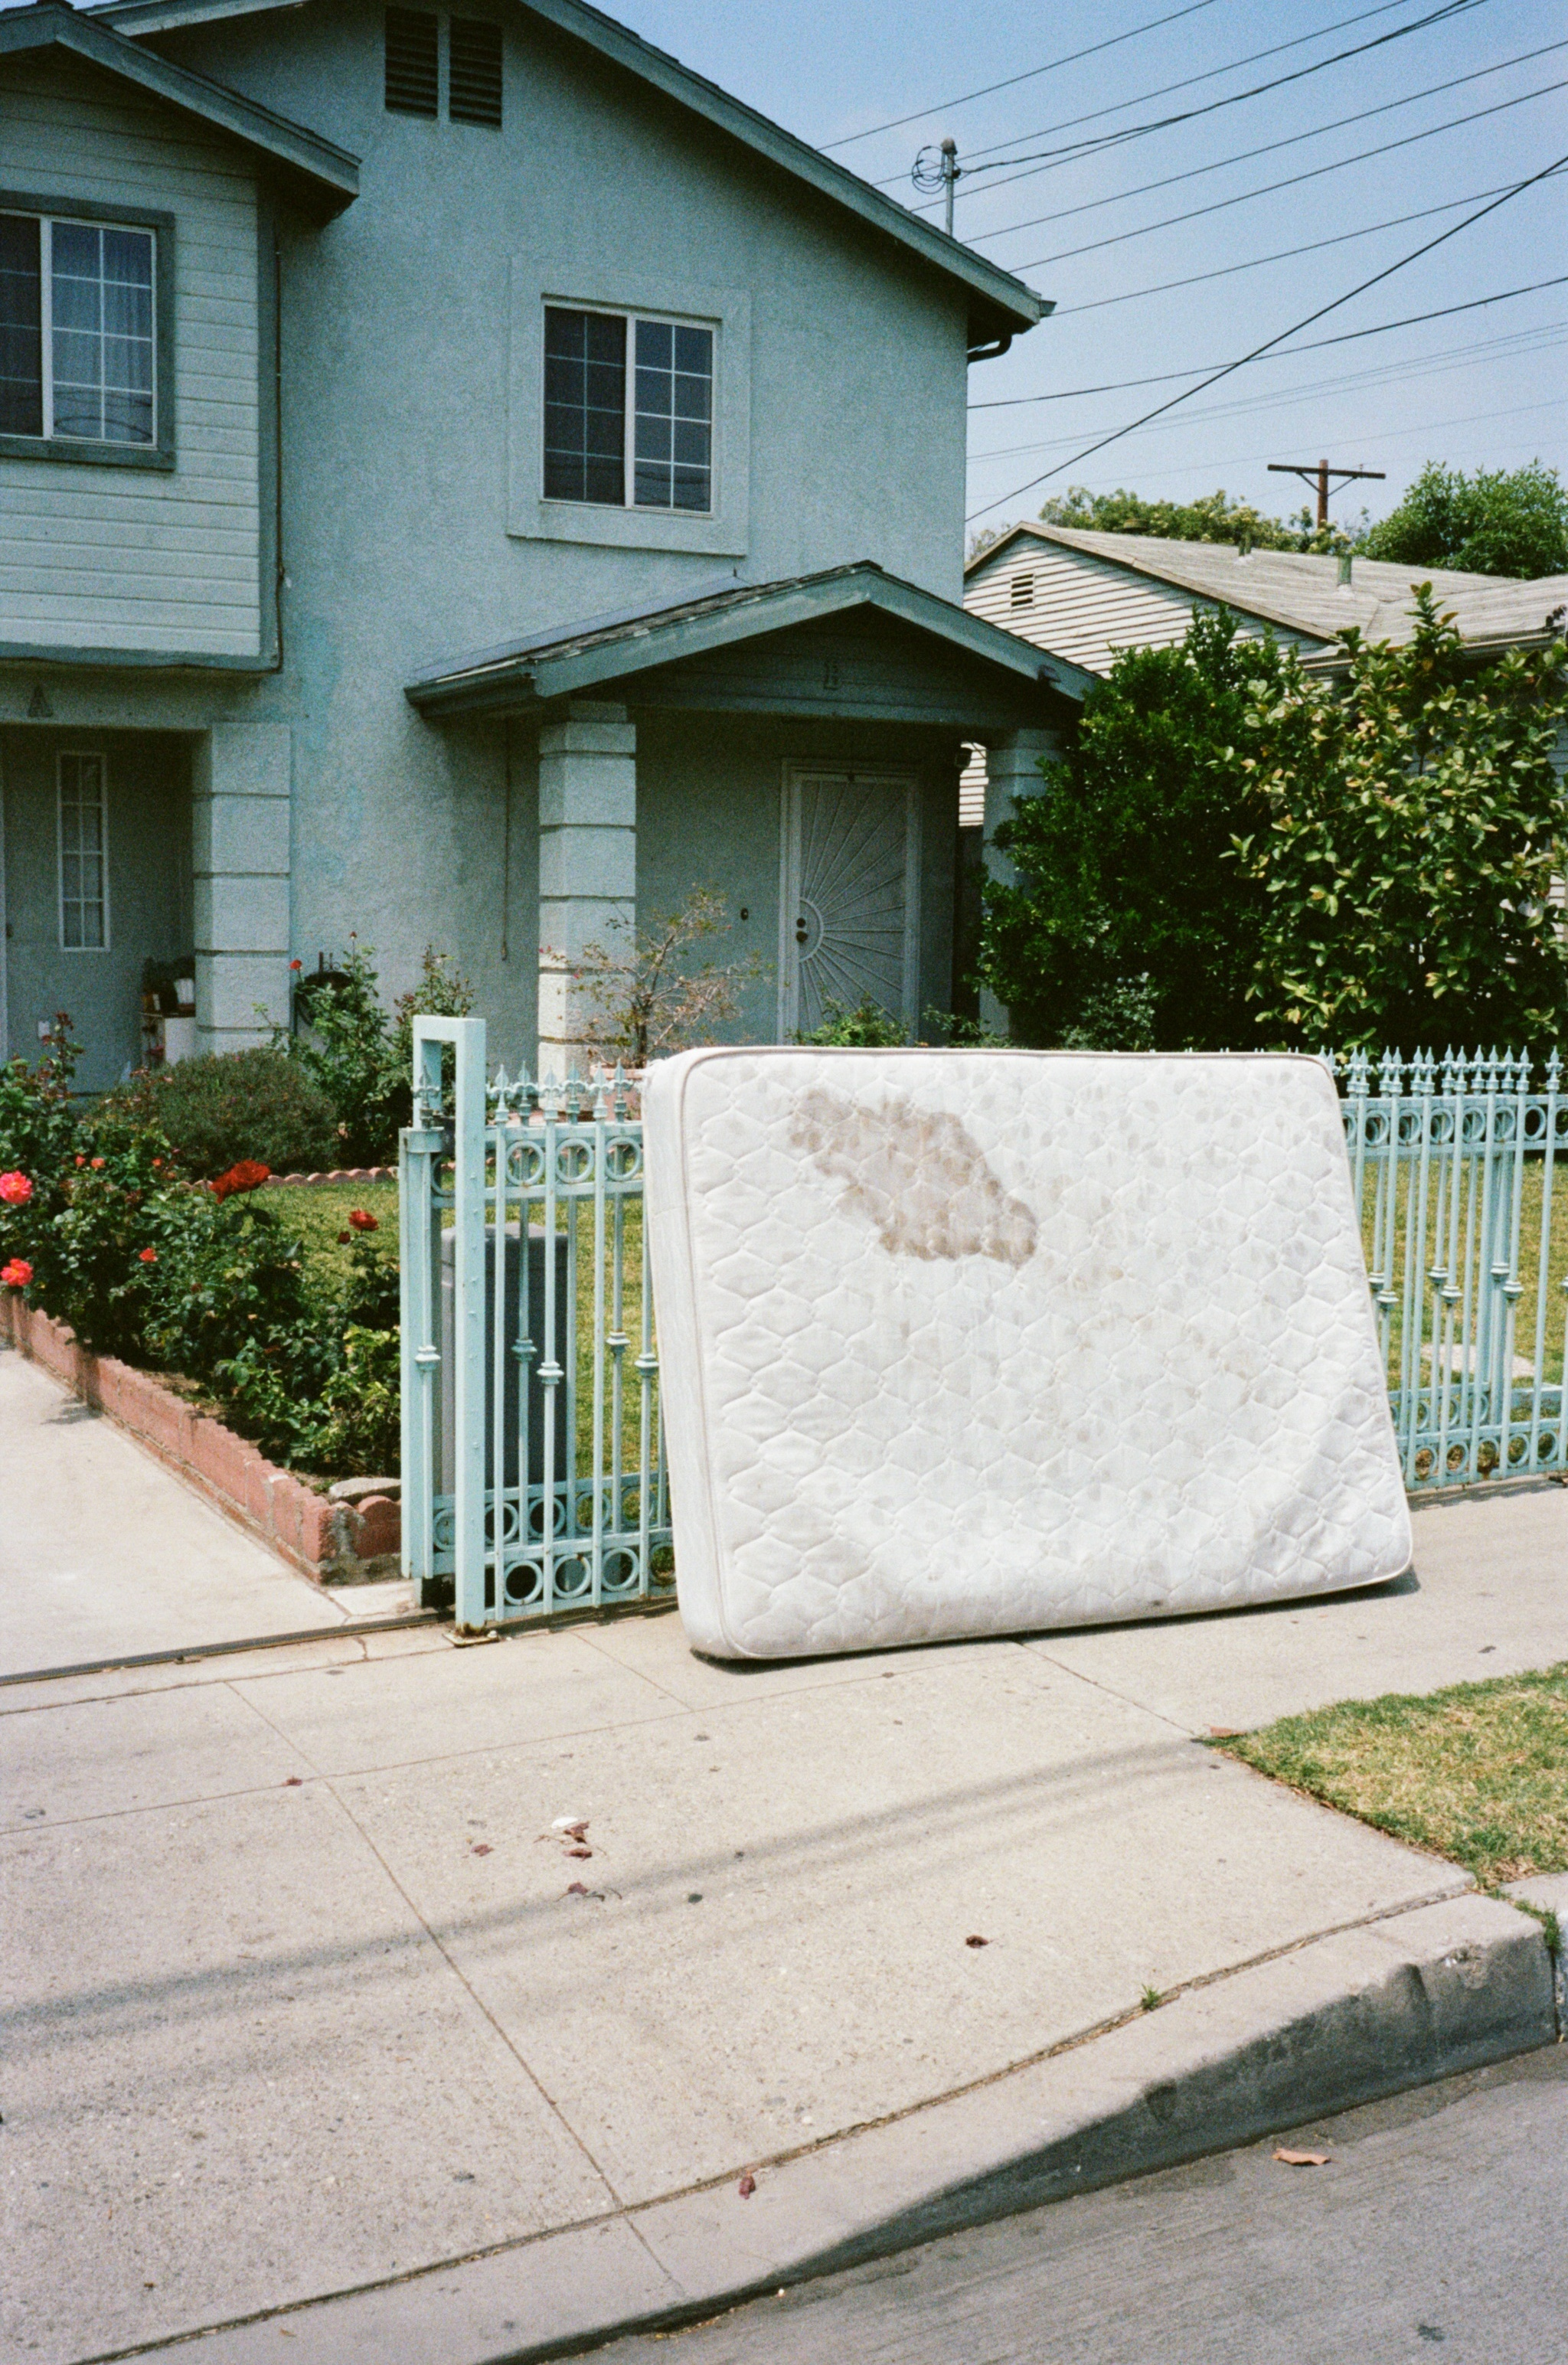 Elysian Valley, Los Angeles County, California